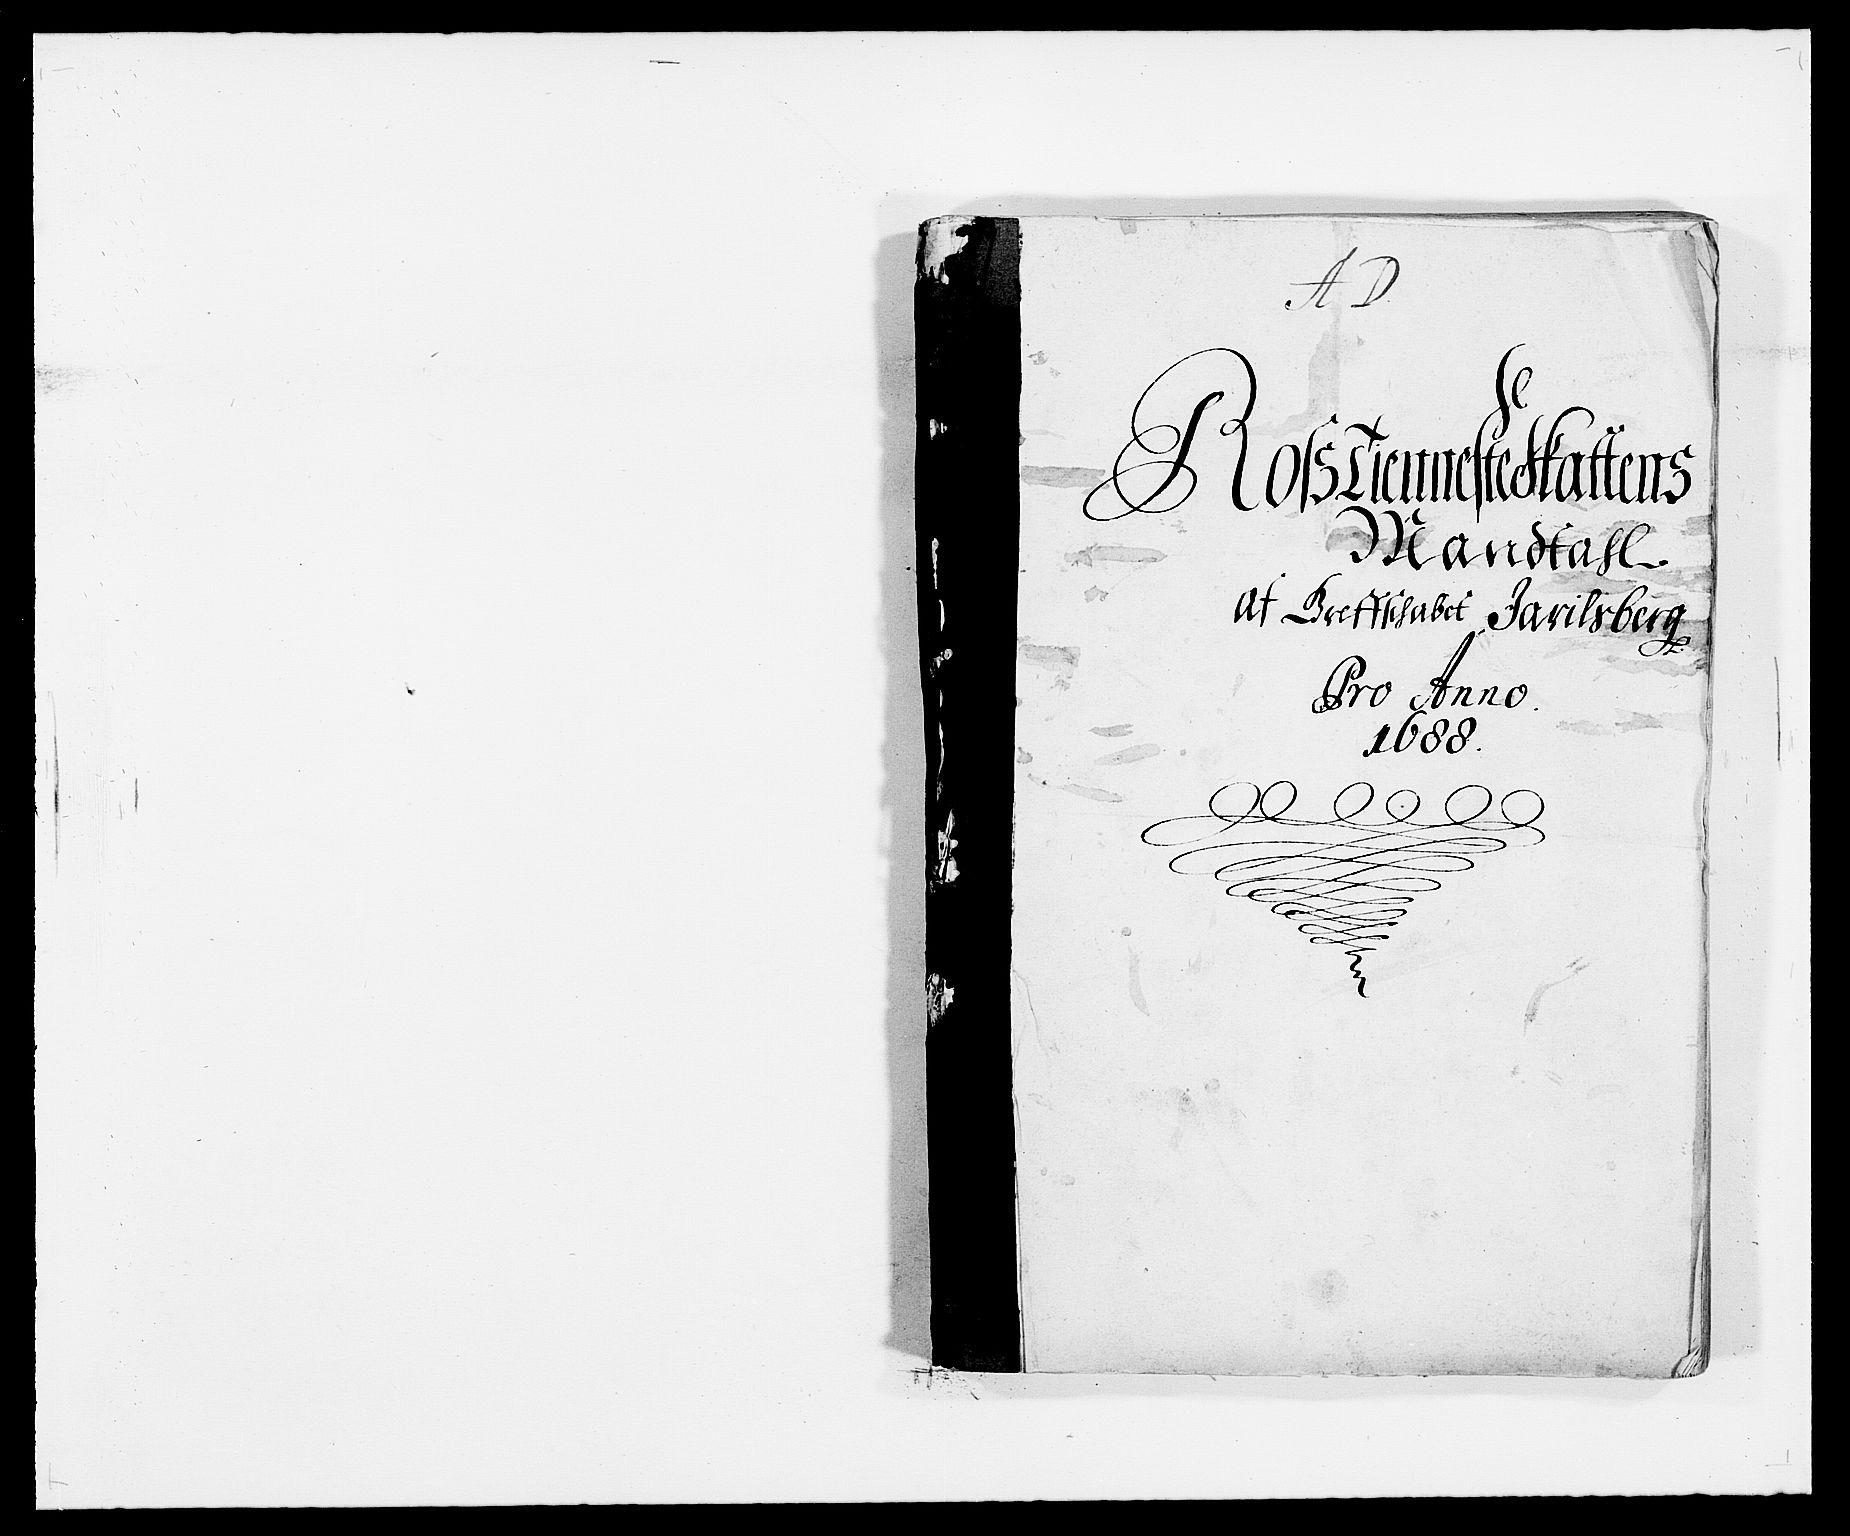 RA, Rentekammeret inntil 1814, Reviderte regnskaper, Fogderegnskap, R32/L1859: Fogderegnskap Jarlsberg grevskap, 1686-1690, s. 250